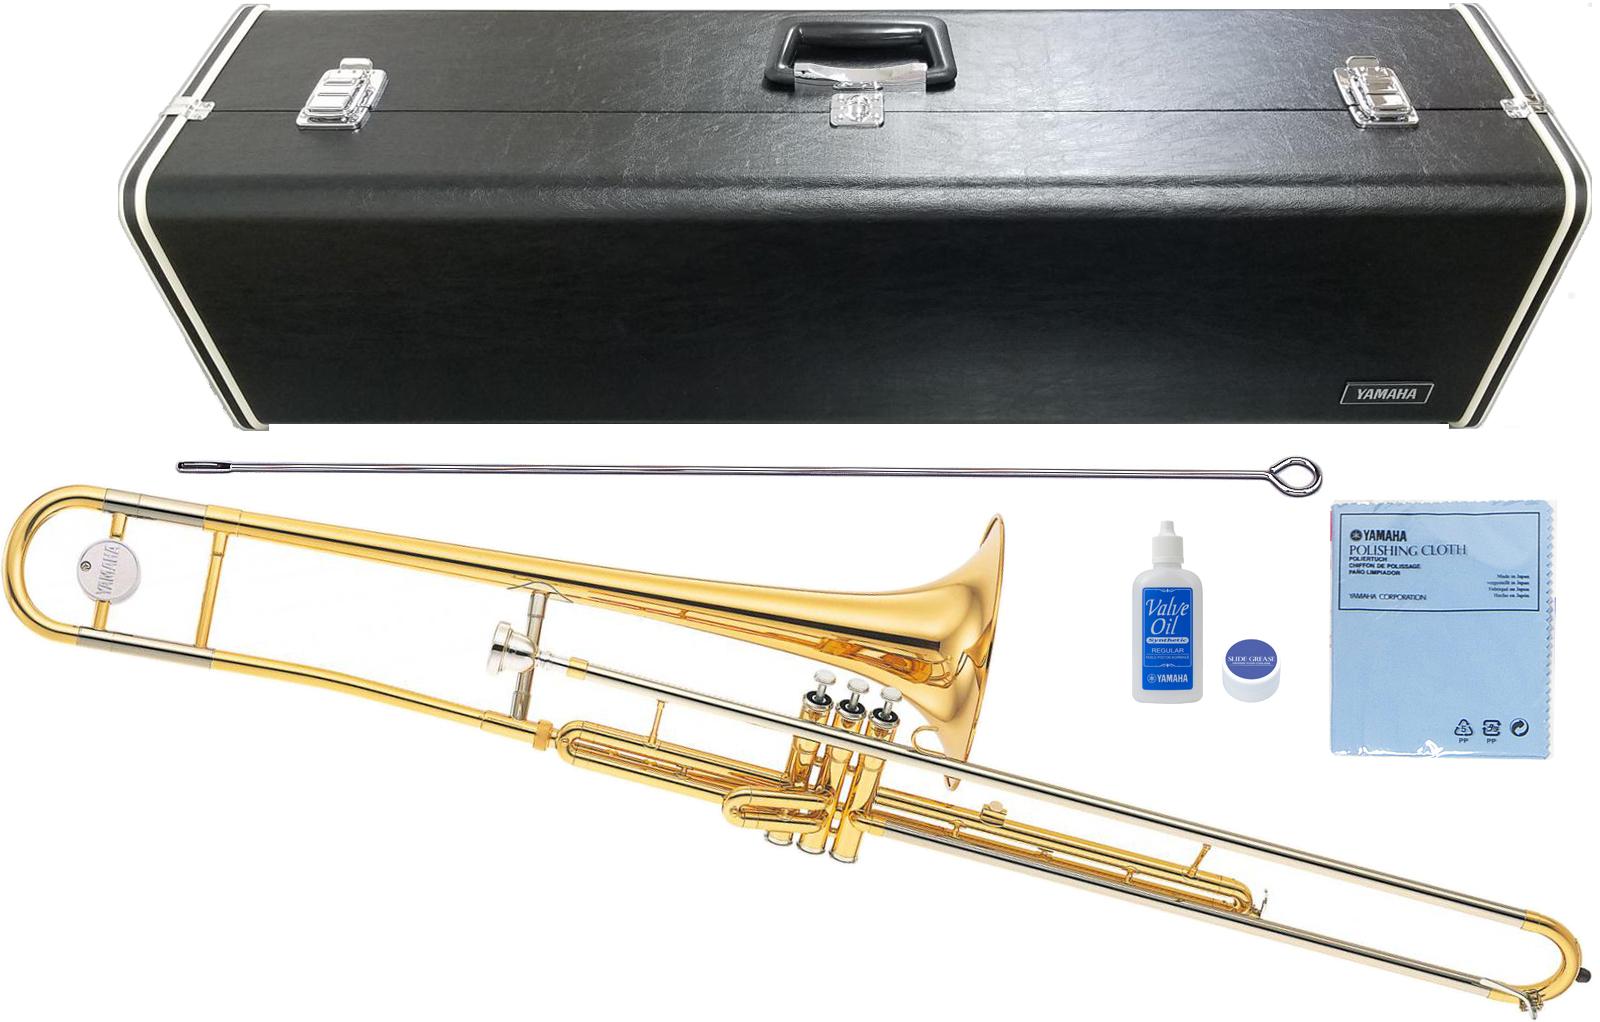 YAMAHA ( ヤマハ ) 楽器 YSL-354V ピストン式 バルブトロンボーン ゴールド 新品 新品 日本製 トロンボーン B♭管 細管 楽器 本体 マーチング 日本製 管楽器 送料無料, ナチュラル美健:eabbc8cd --- officewill.xsrv.jp